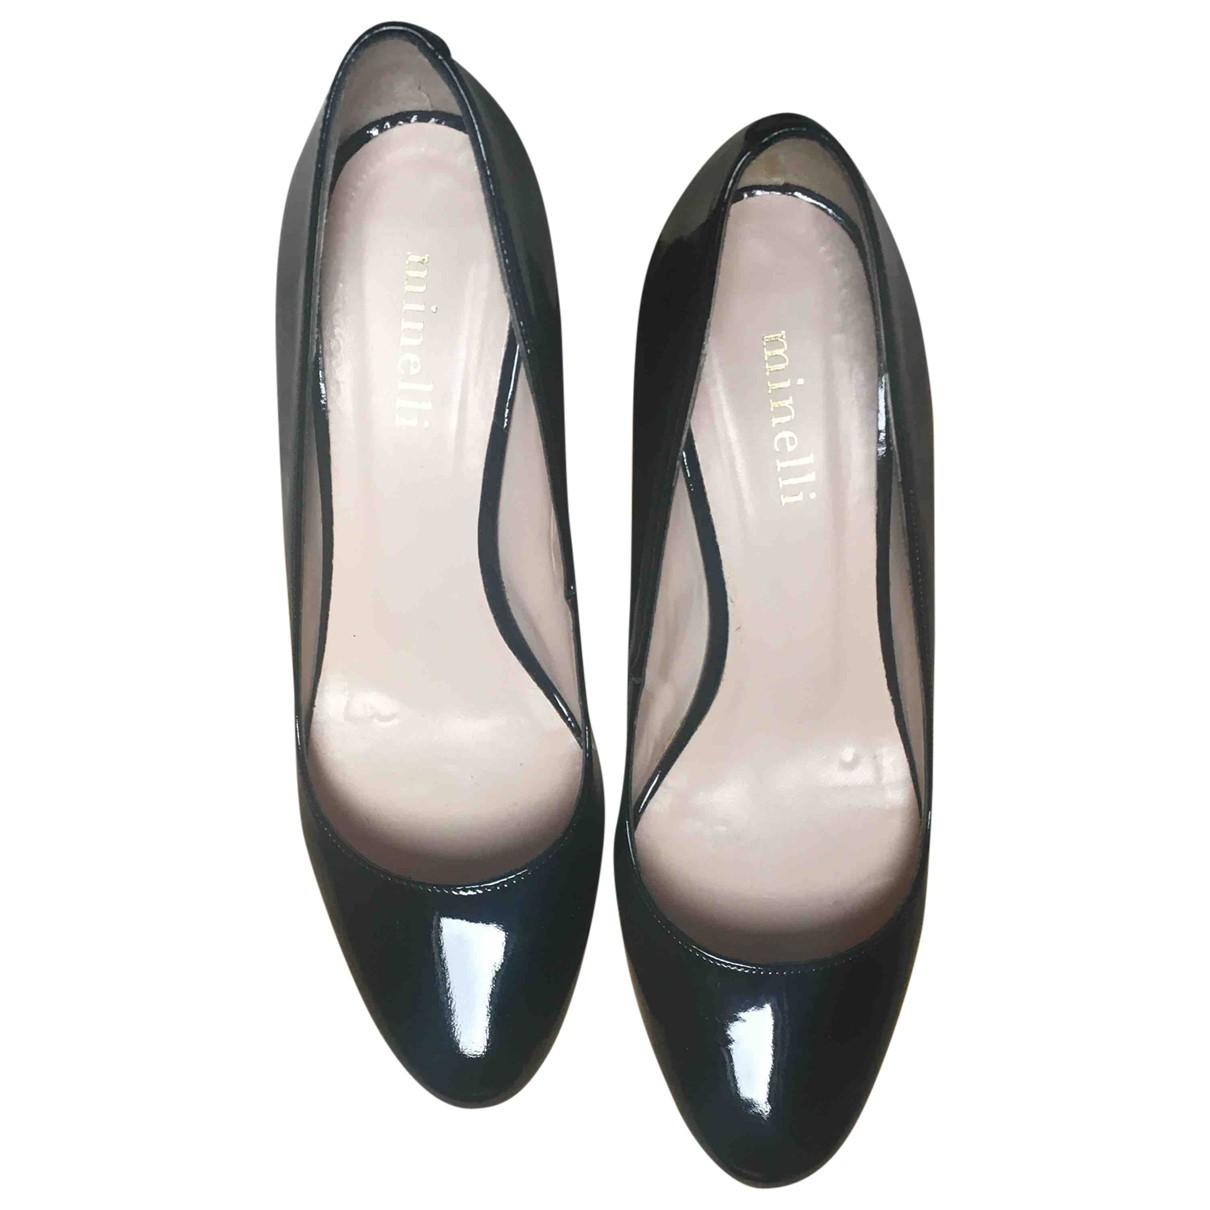 Minelli \N Black Patent leather Heels for Women 38 EU